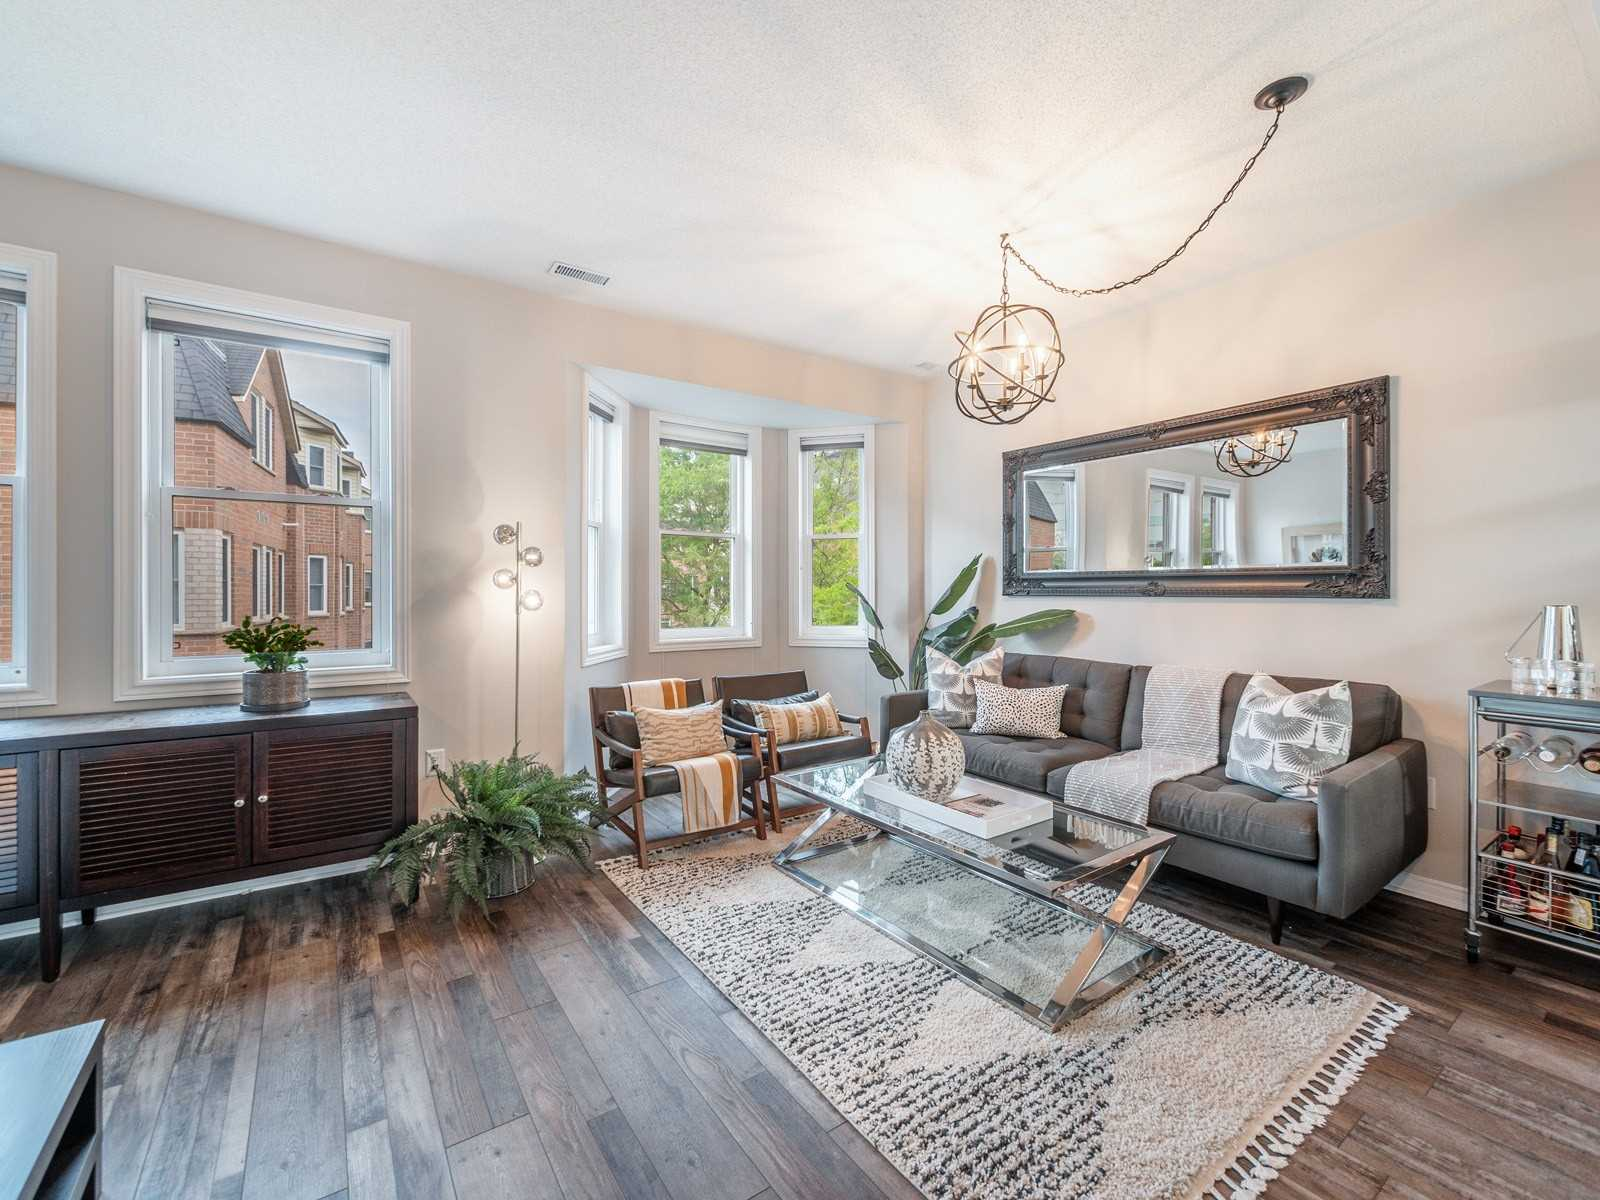 House For Sale Unit 185, 760 Lawrence Ave W, M6A1B8, Yorkdale-Glen Park, Toronto